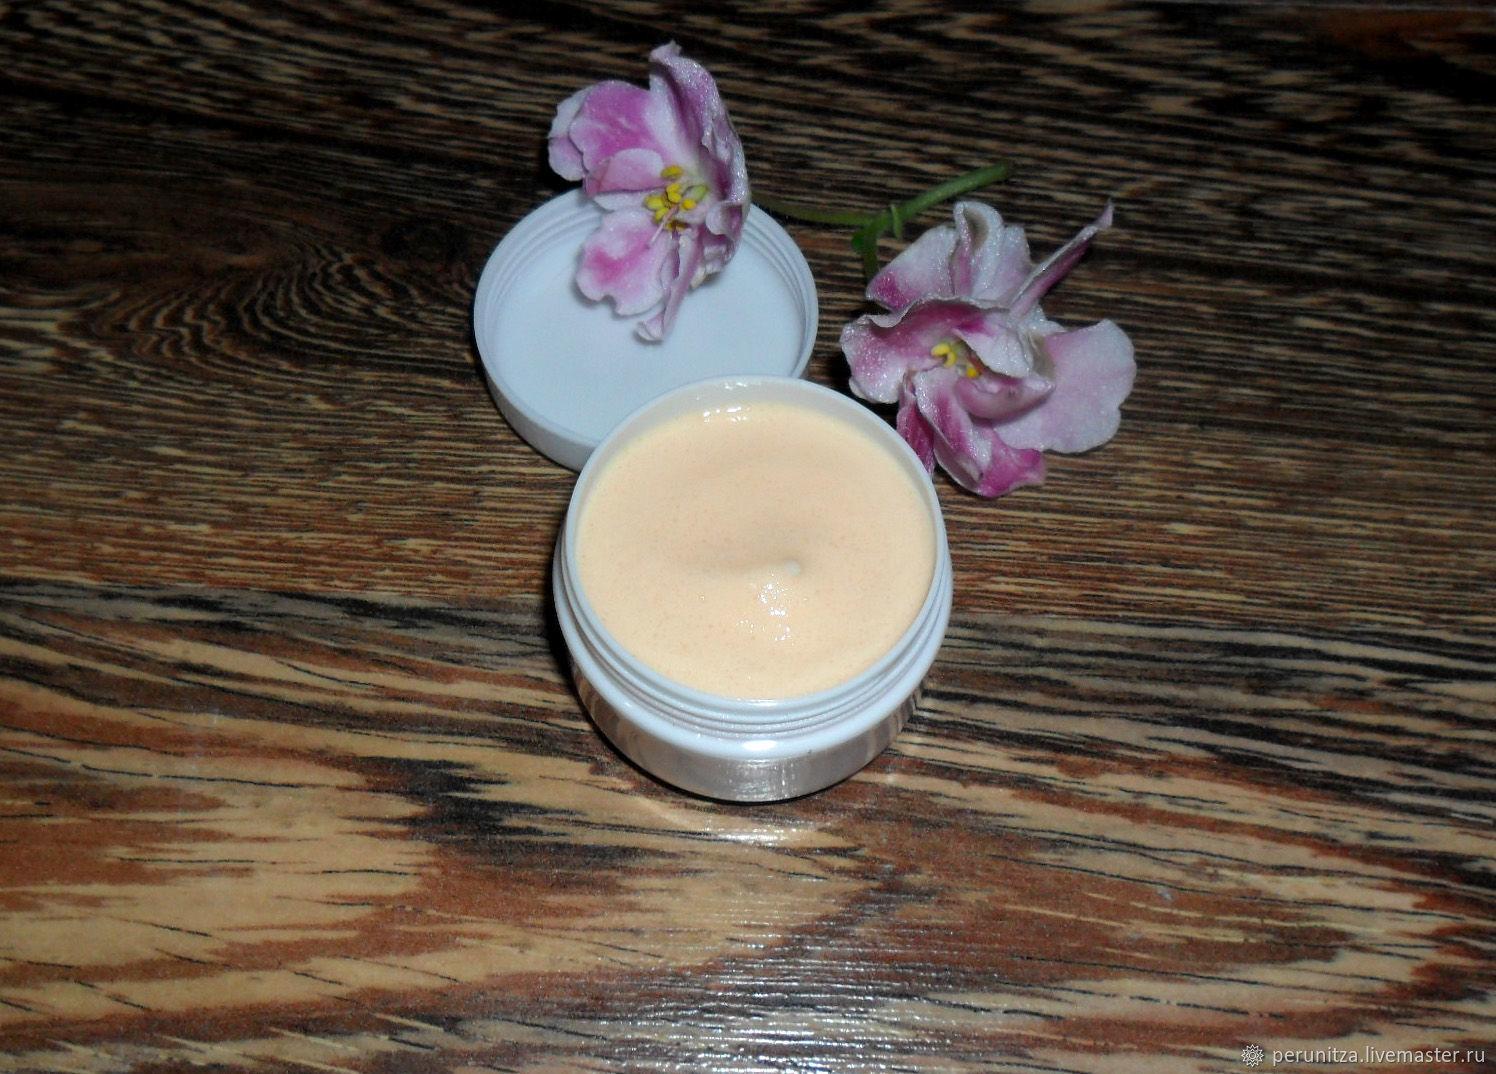 Milolika day cream for dry skin 50ml, Creams, Chrysostom,  Фото №1